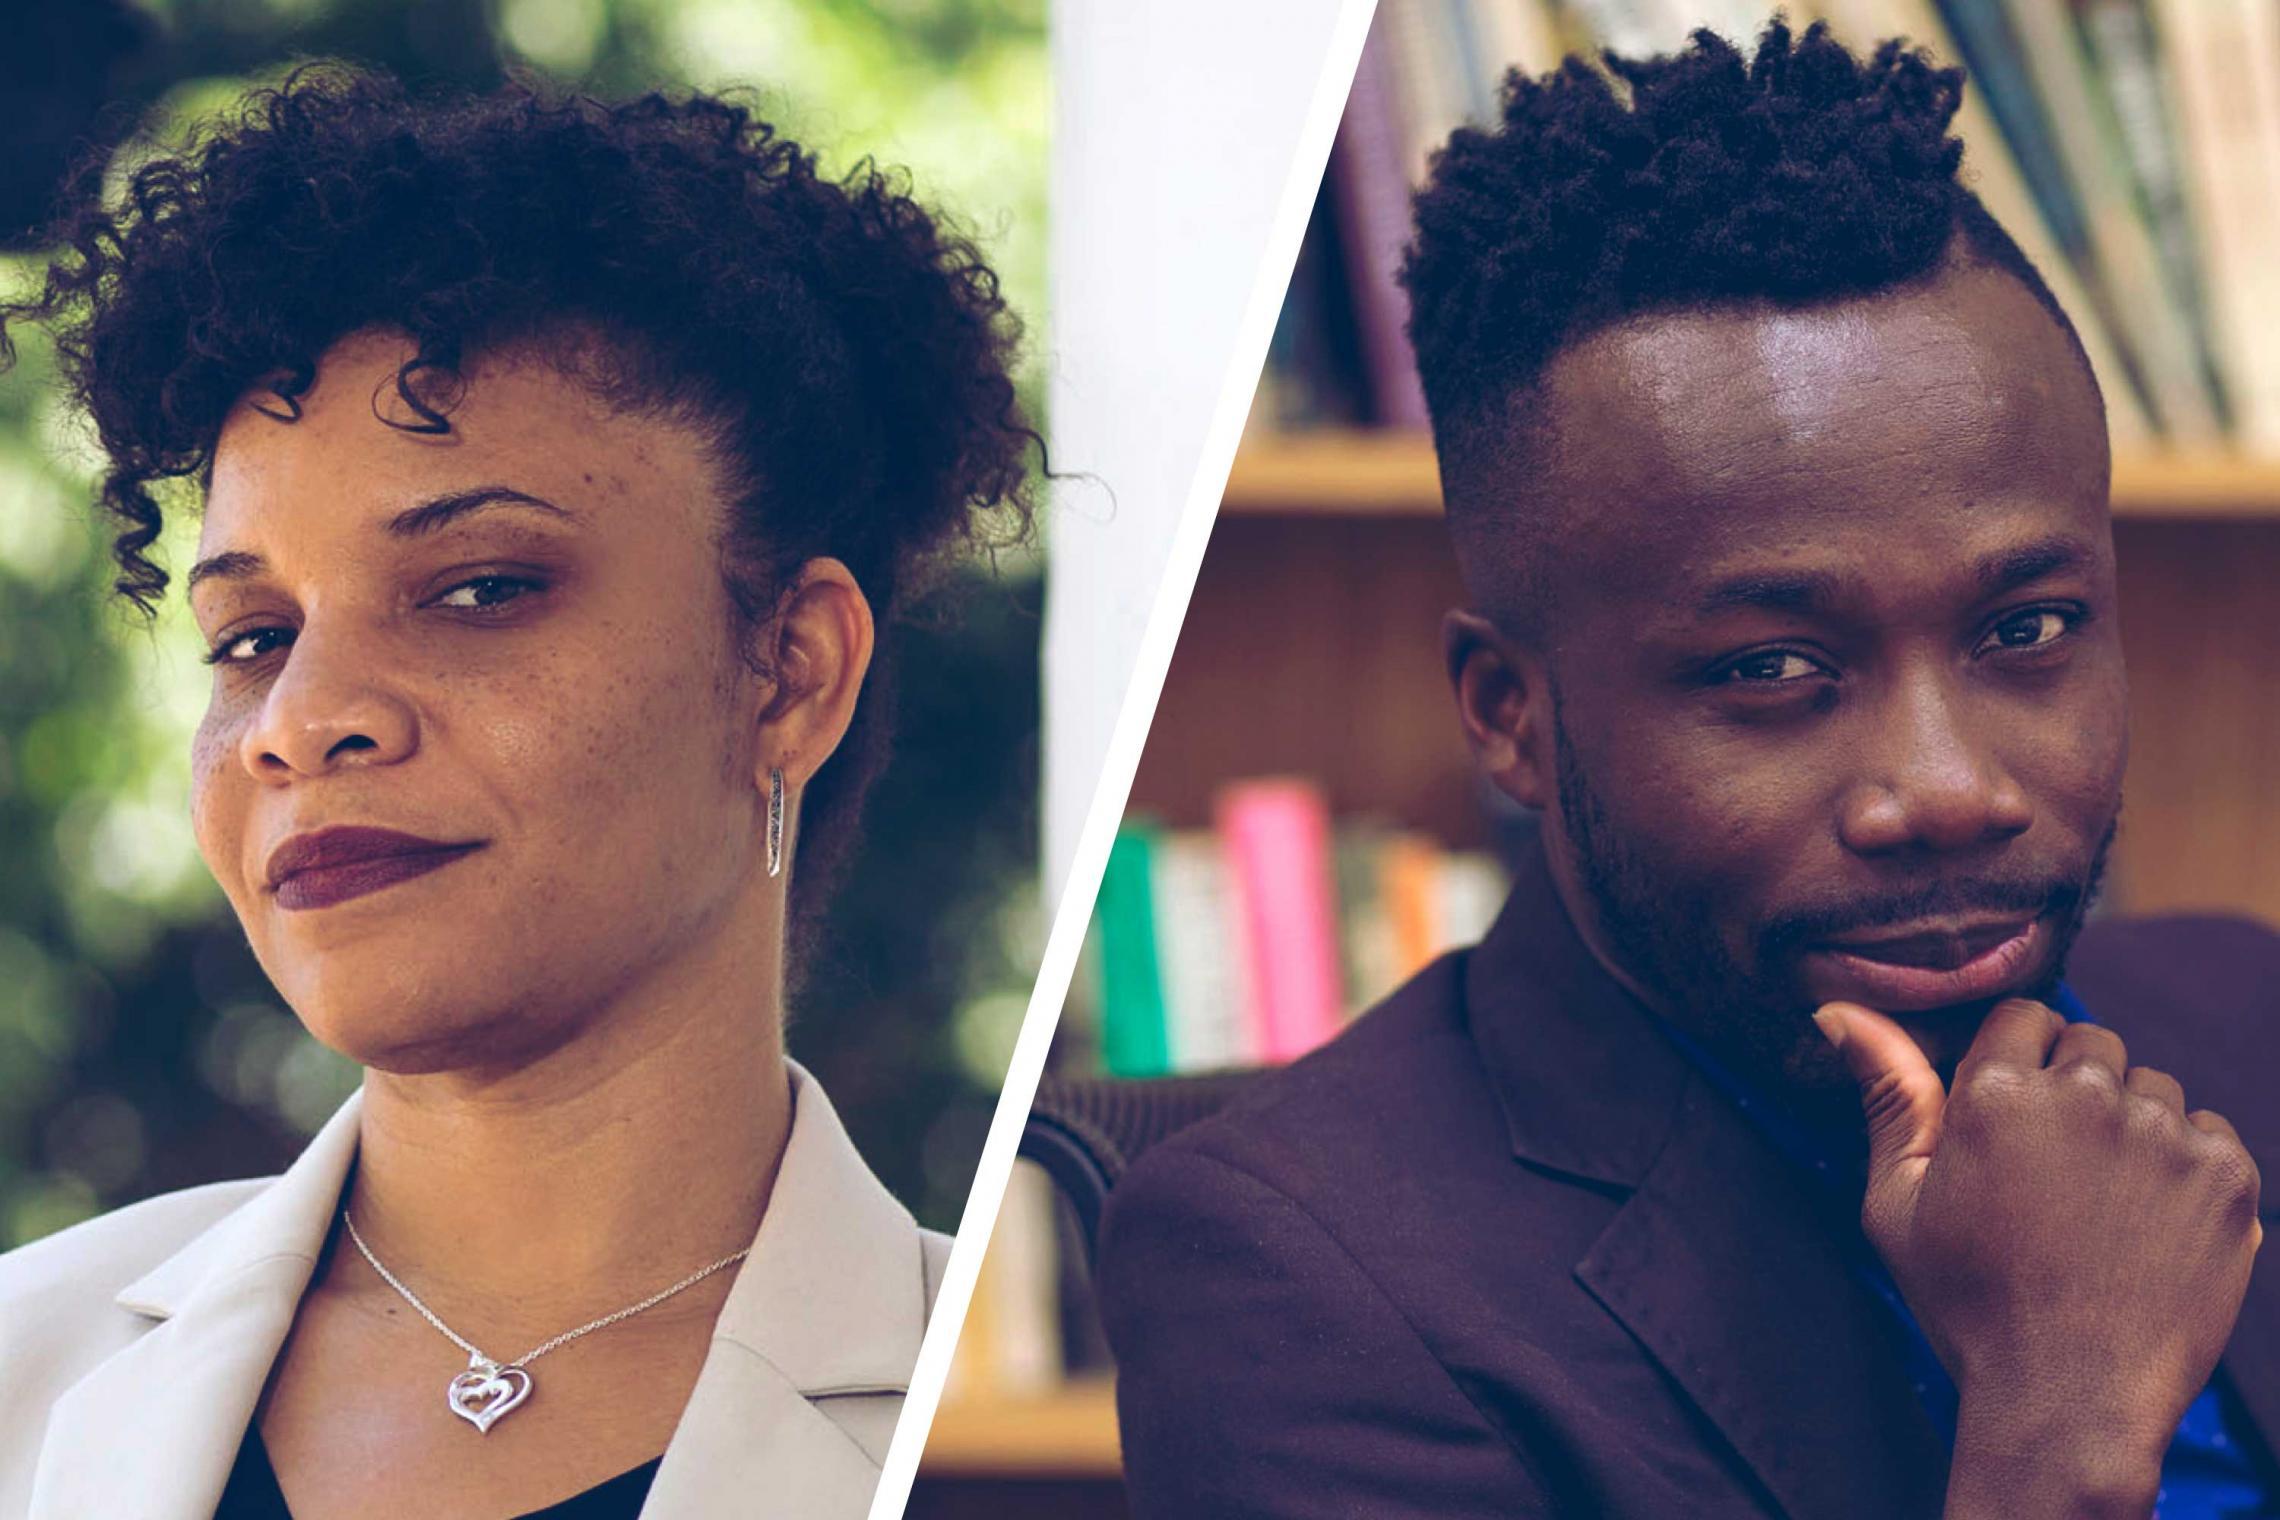 Talitha LeFlouria and Kwame Otu (Photos by Dan Addison/University Communications)